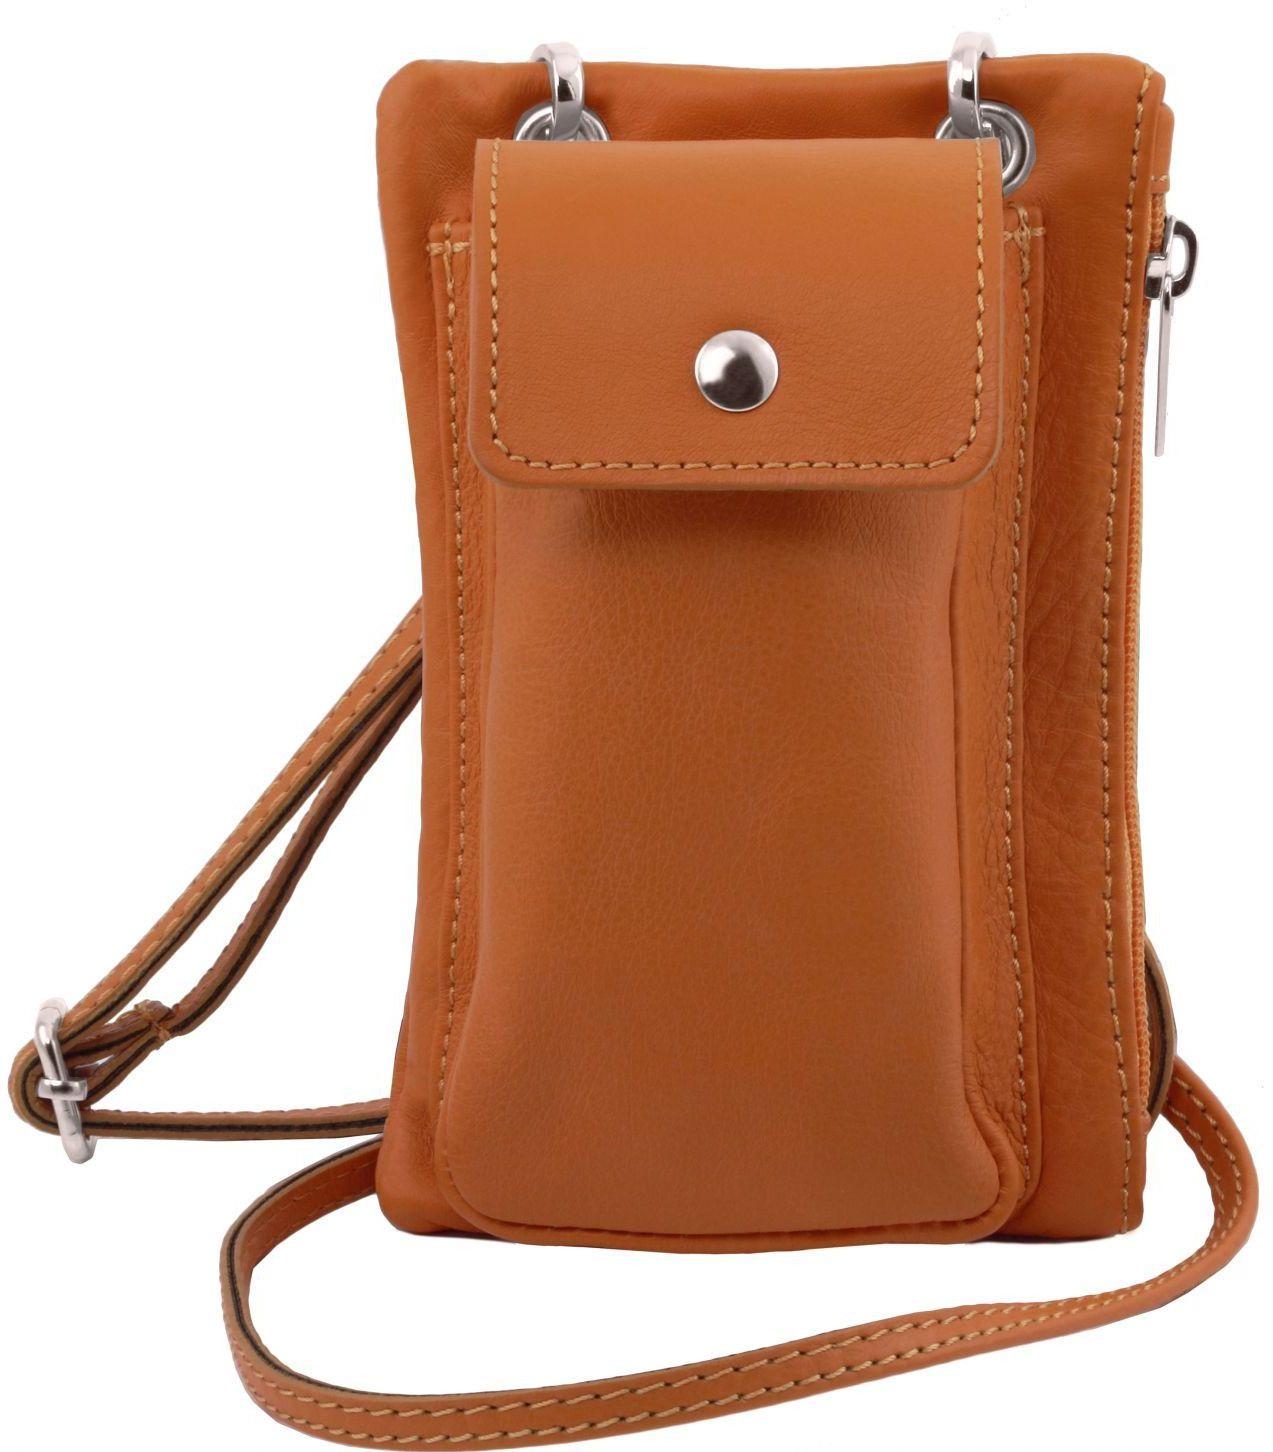 Unisex Τσαντάκι Δερμάτινο Mini Cross TL141423 Κονιάκ Tuscany Leather γυναίκα   τσάντες ώμου   χειρός